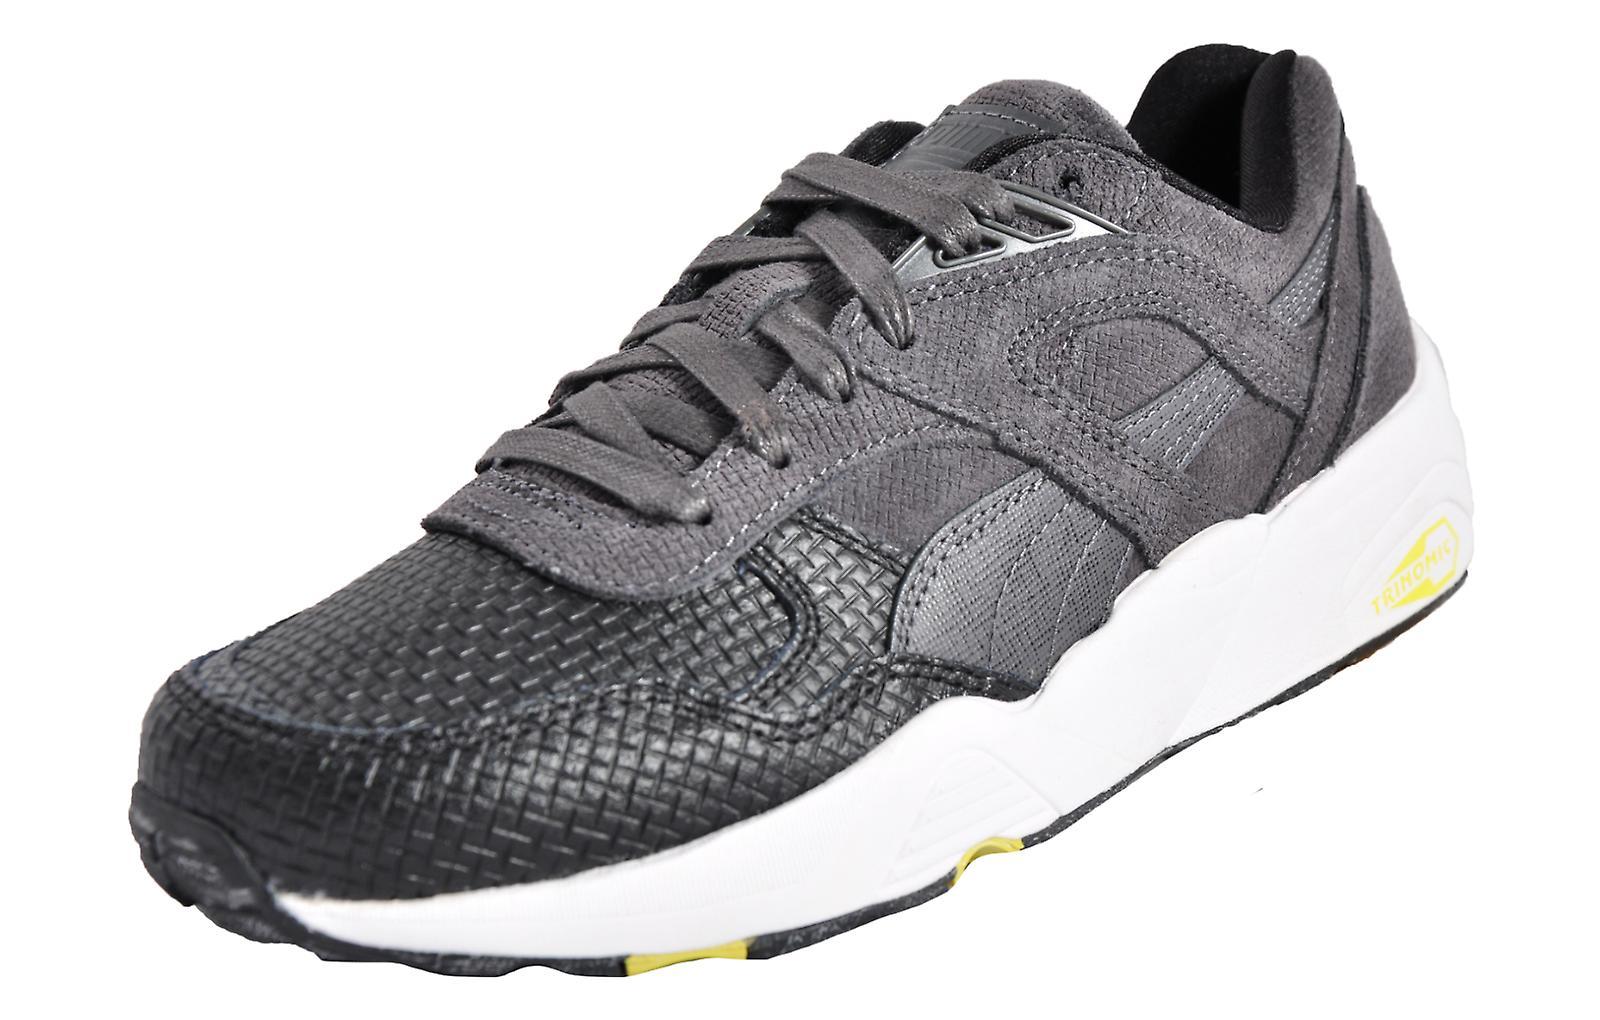 Puma Trinomic R698 Grid Q4 Black / Grey